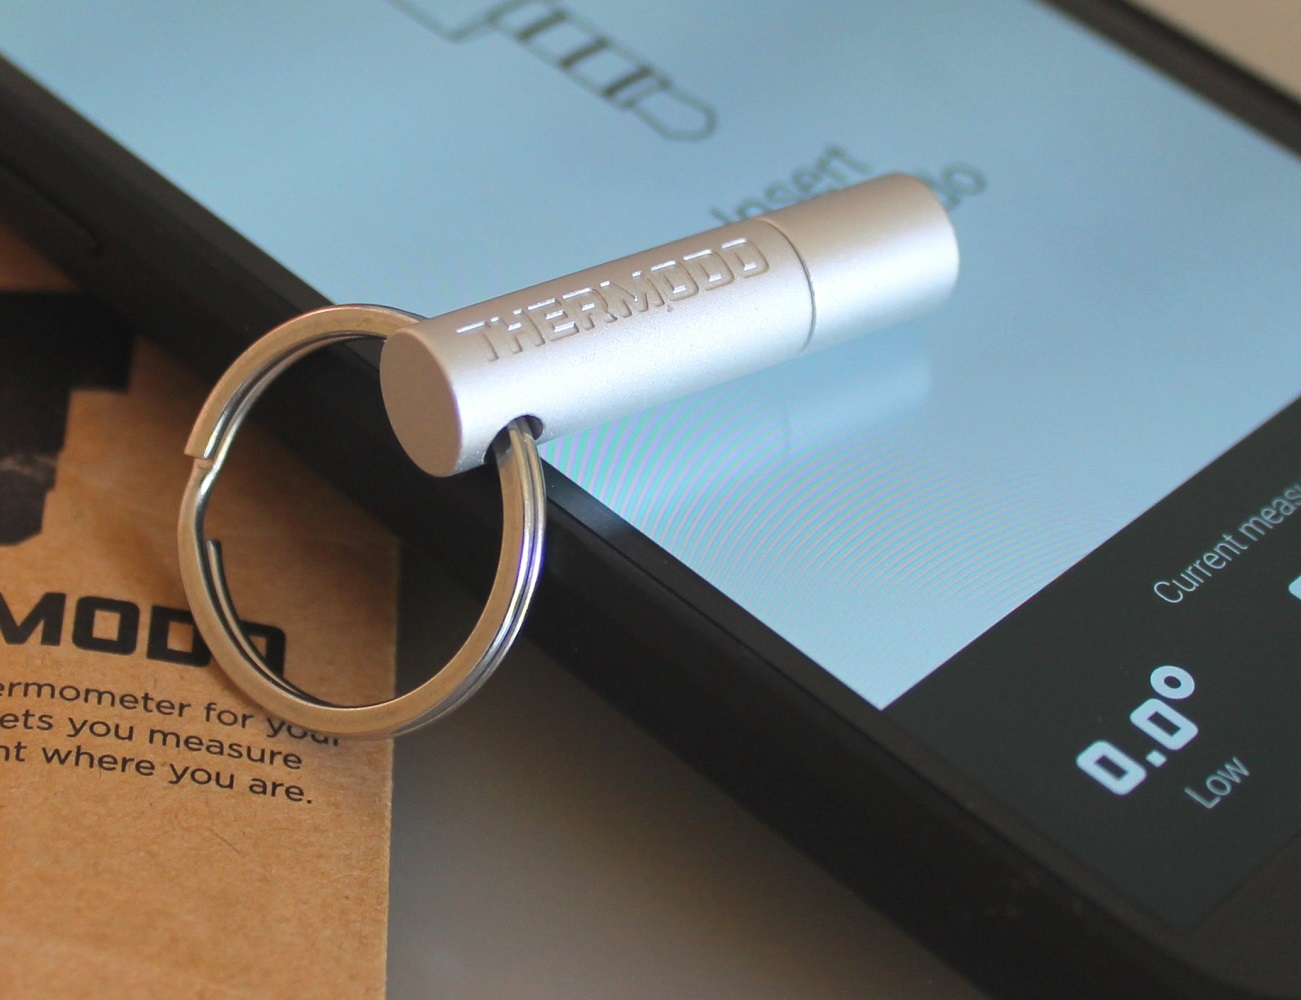 Smartphone Temperature Sensor